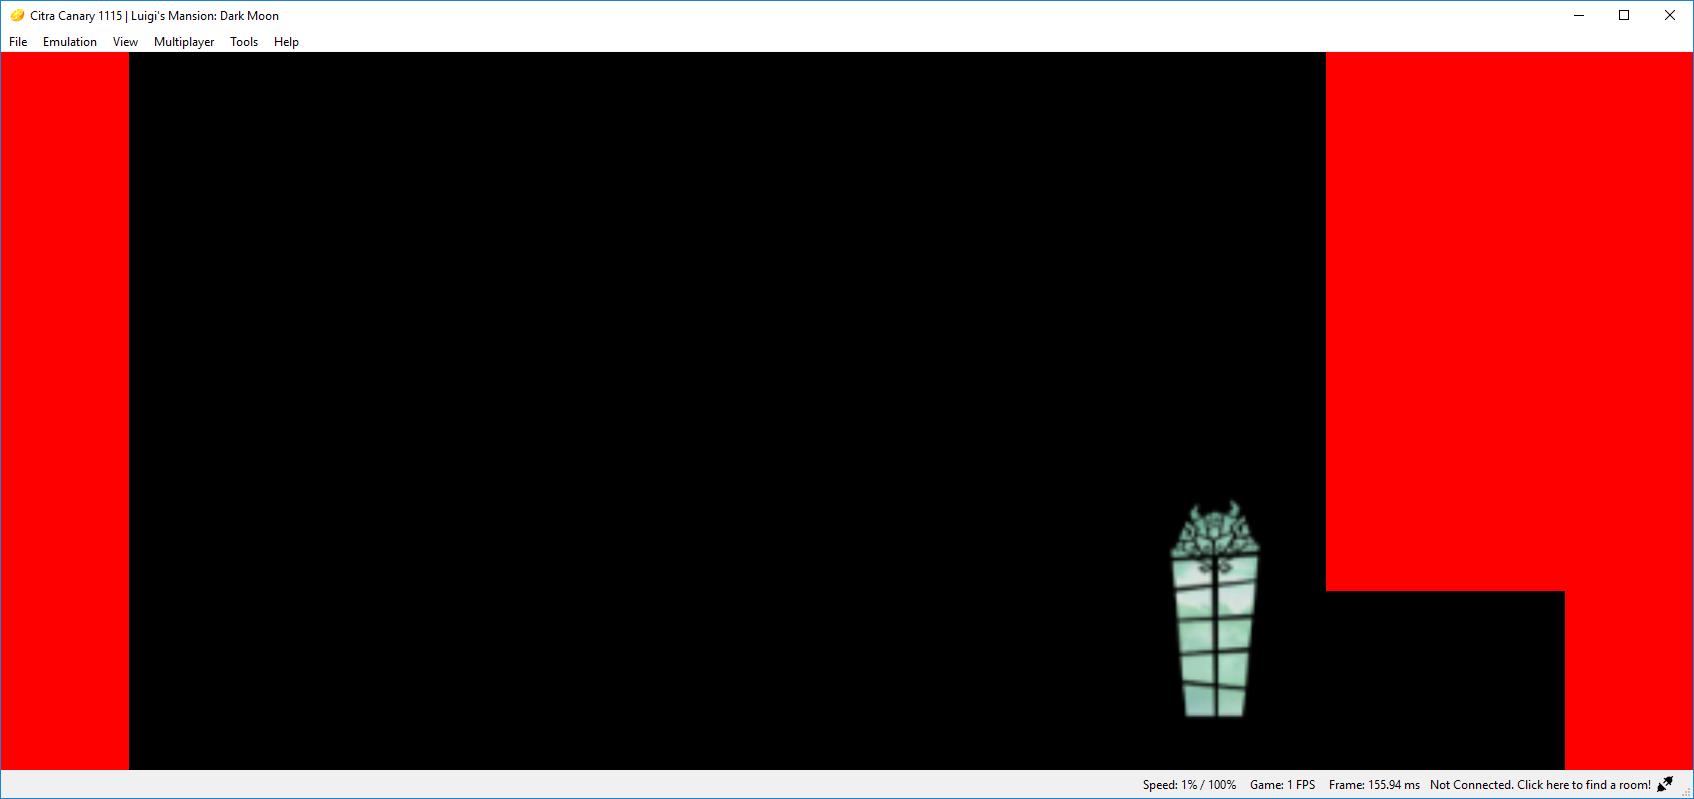 Luigi mansion 2 freezing on intro - Citra Support - Citra